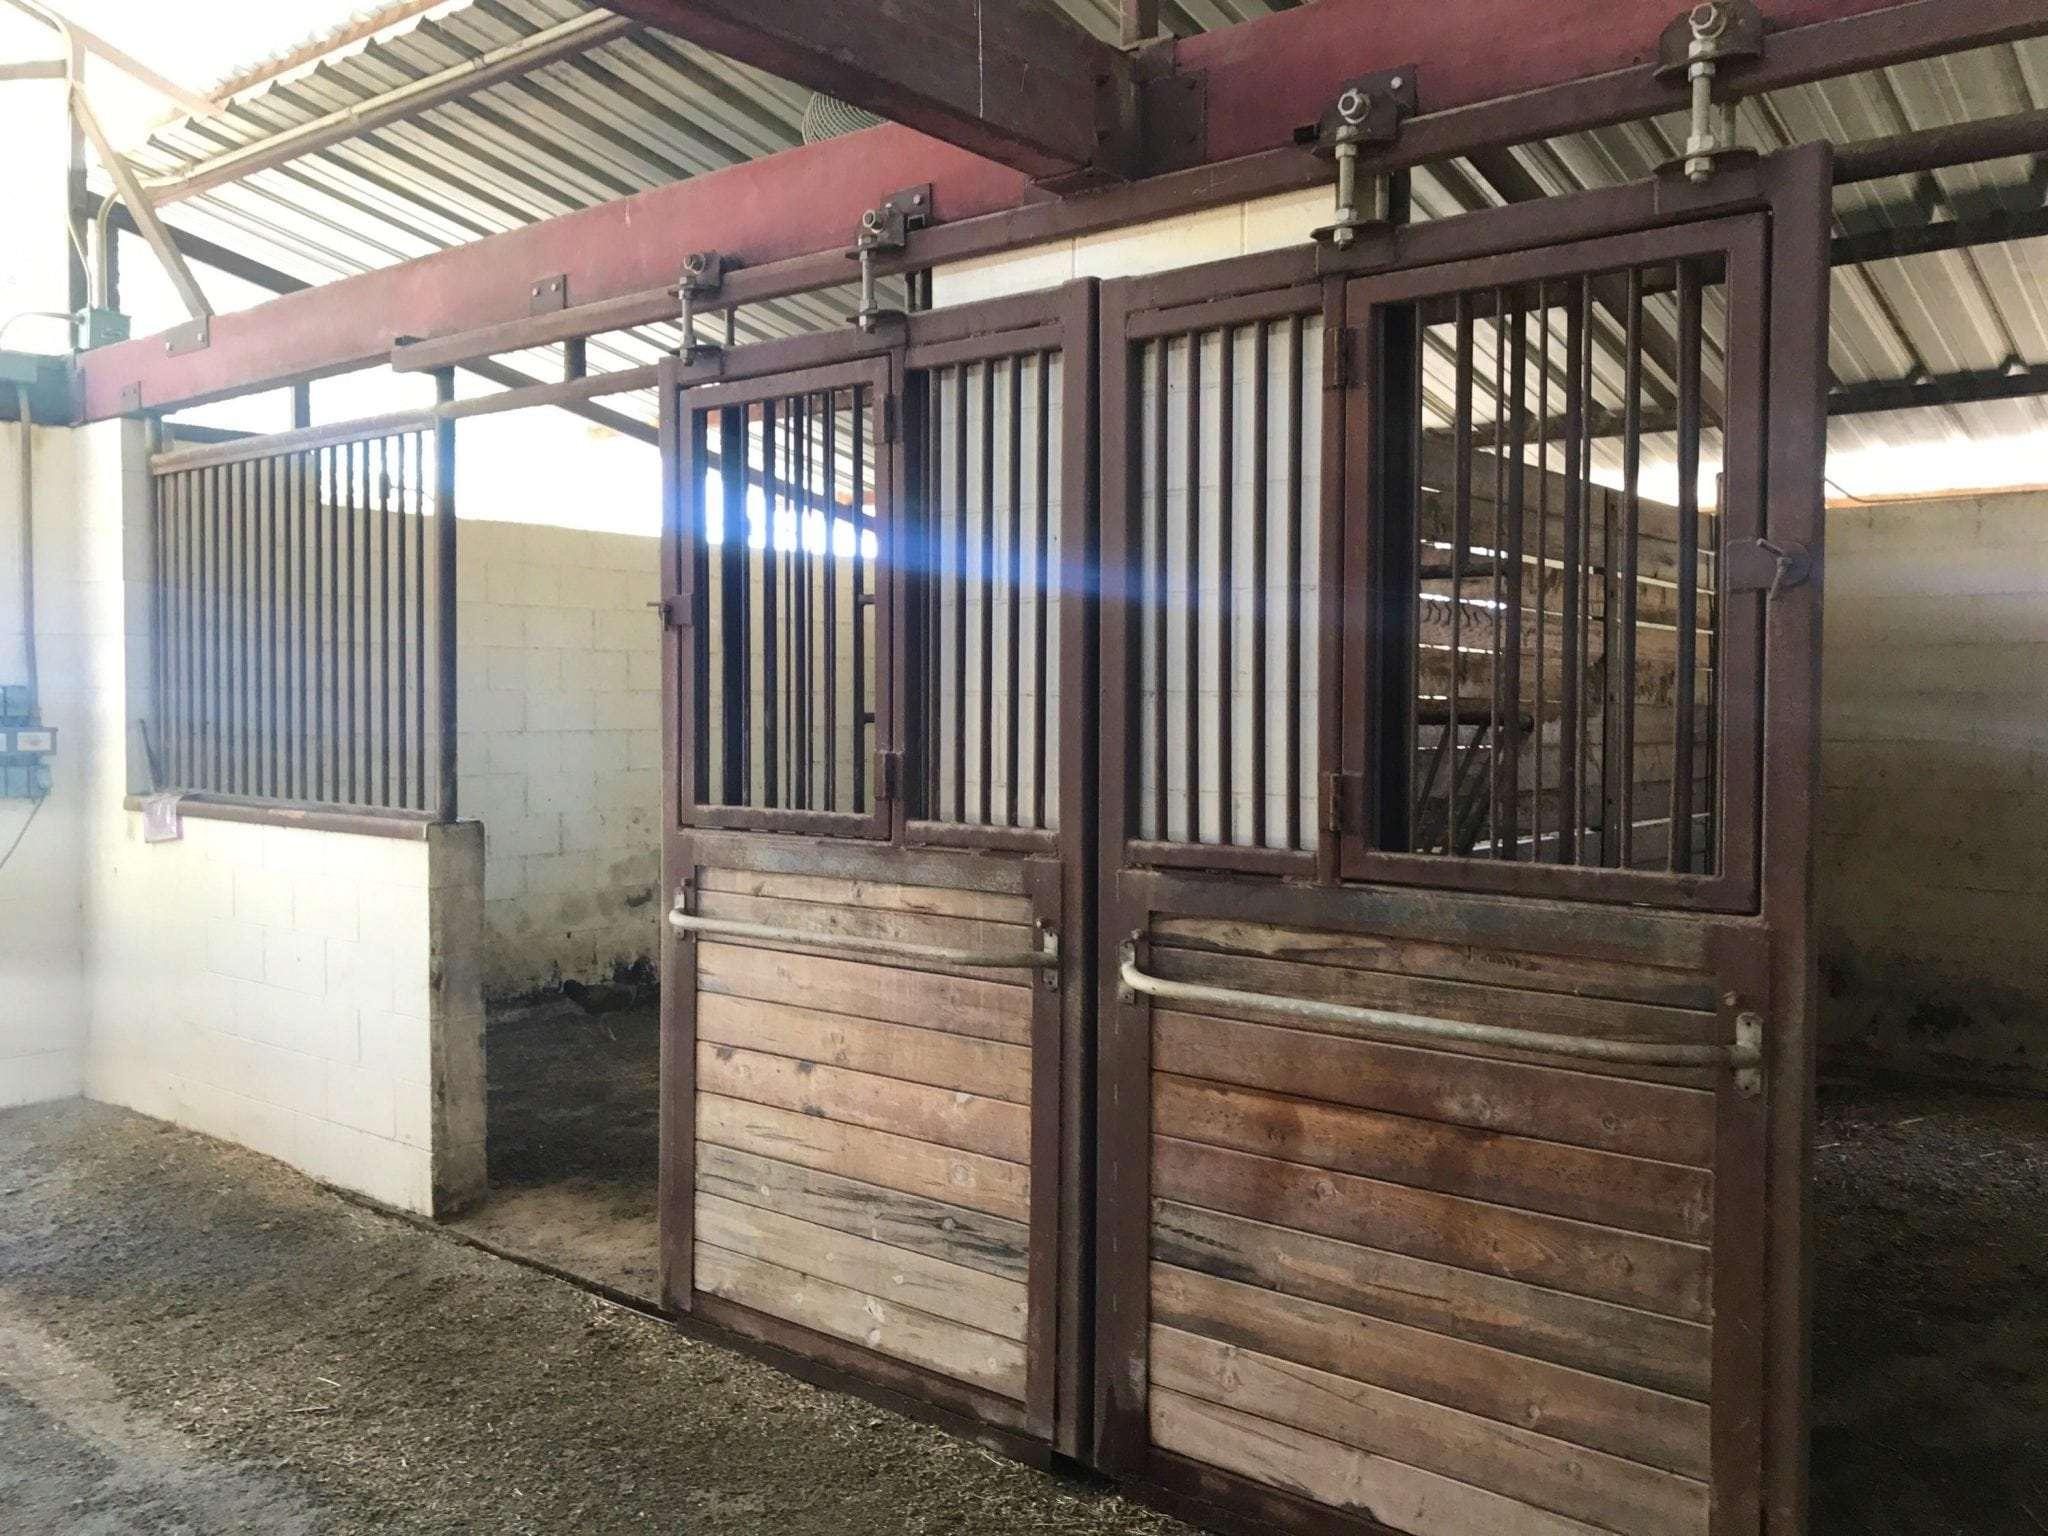 42.57 Acre Home, Horse and Open Land, Ranch, Visalia